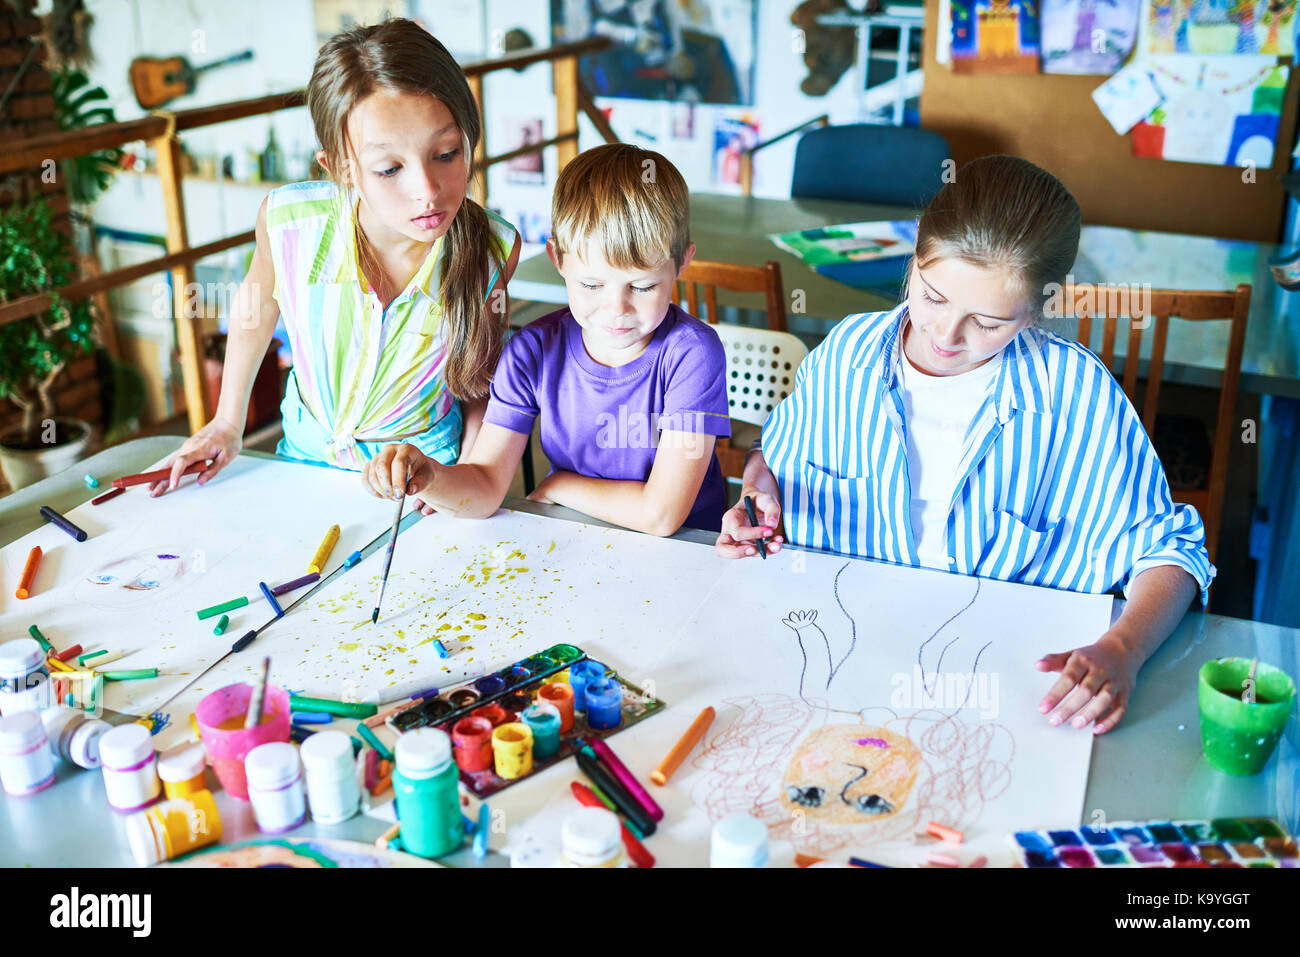 Kids painting class stock photos kids painting class for Kids painting classes